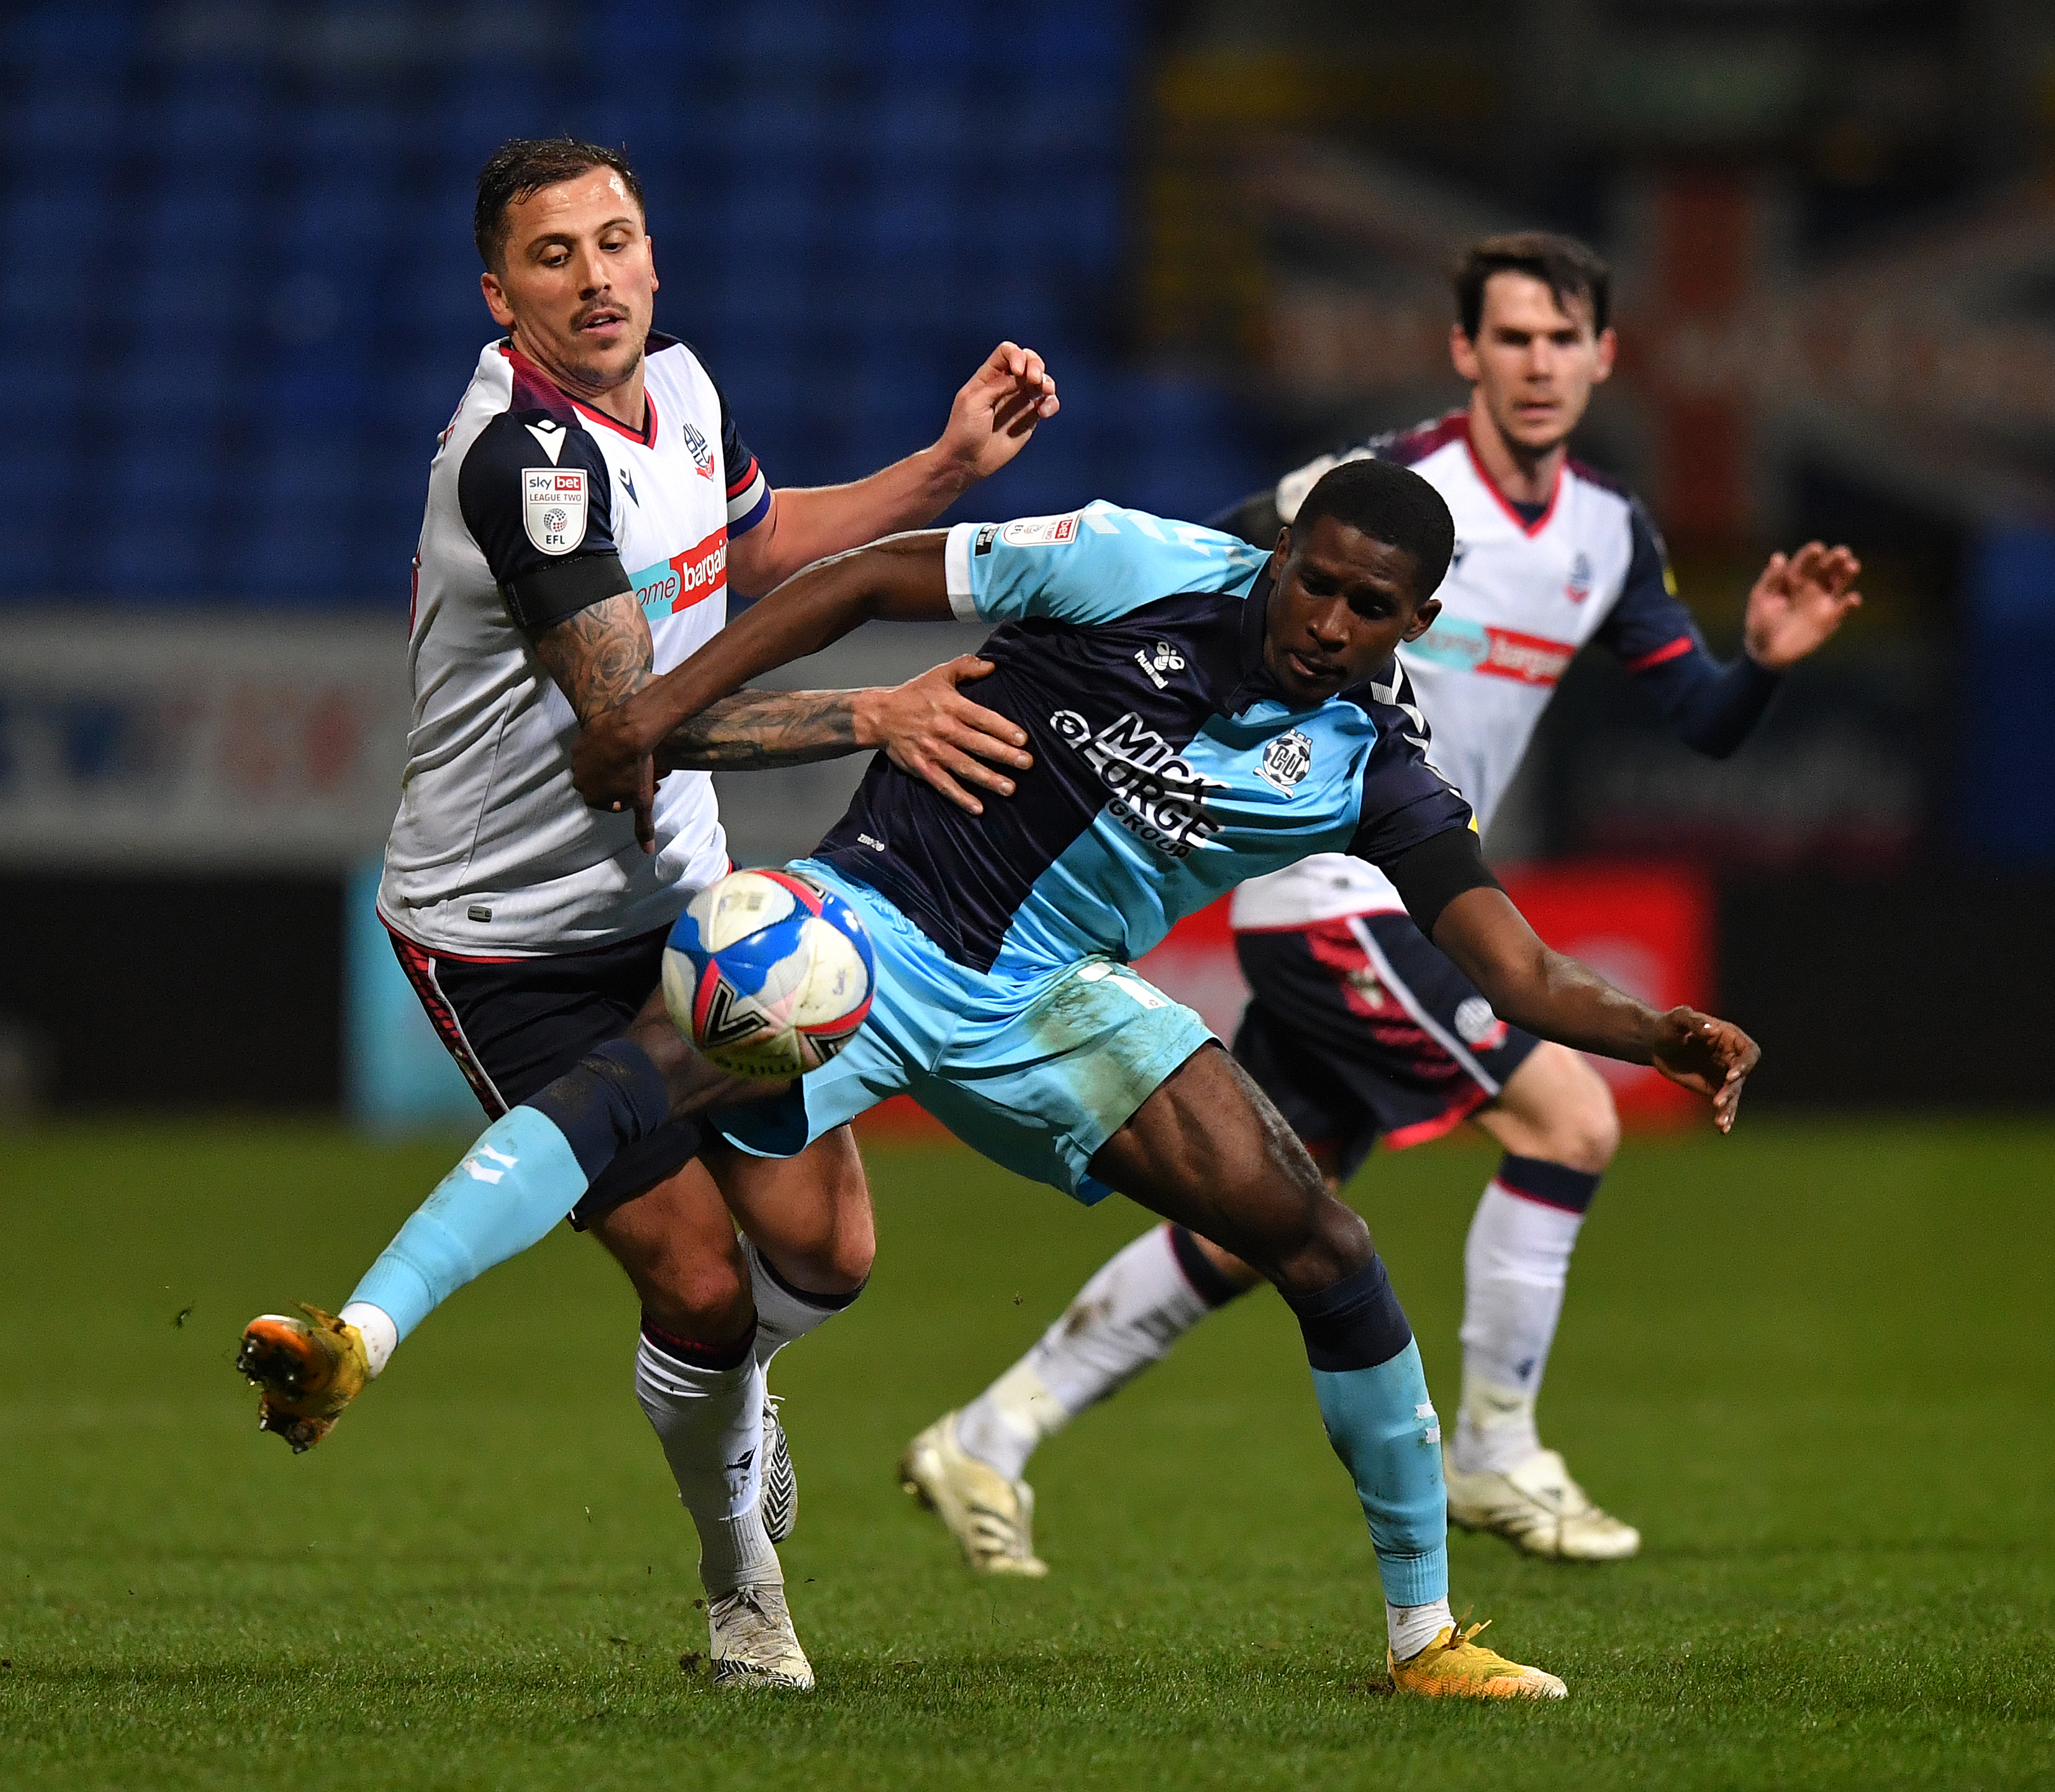 Bolton Wanderers v Cambridge United - Sky Bet League Two